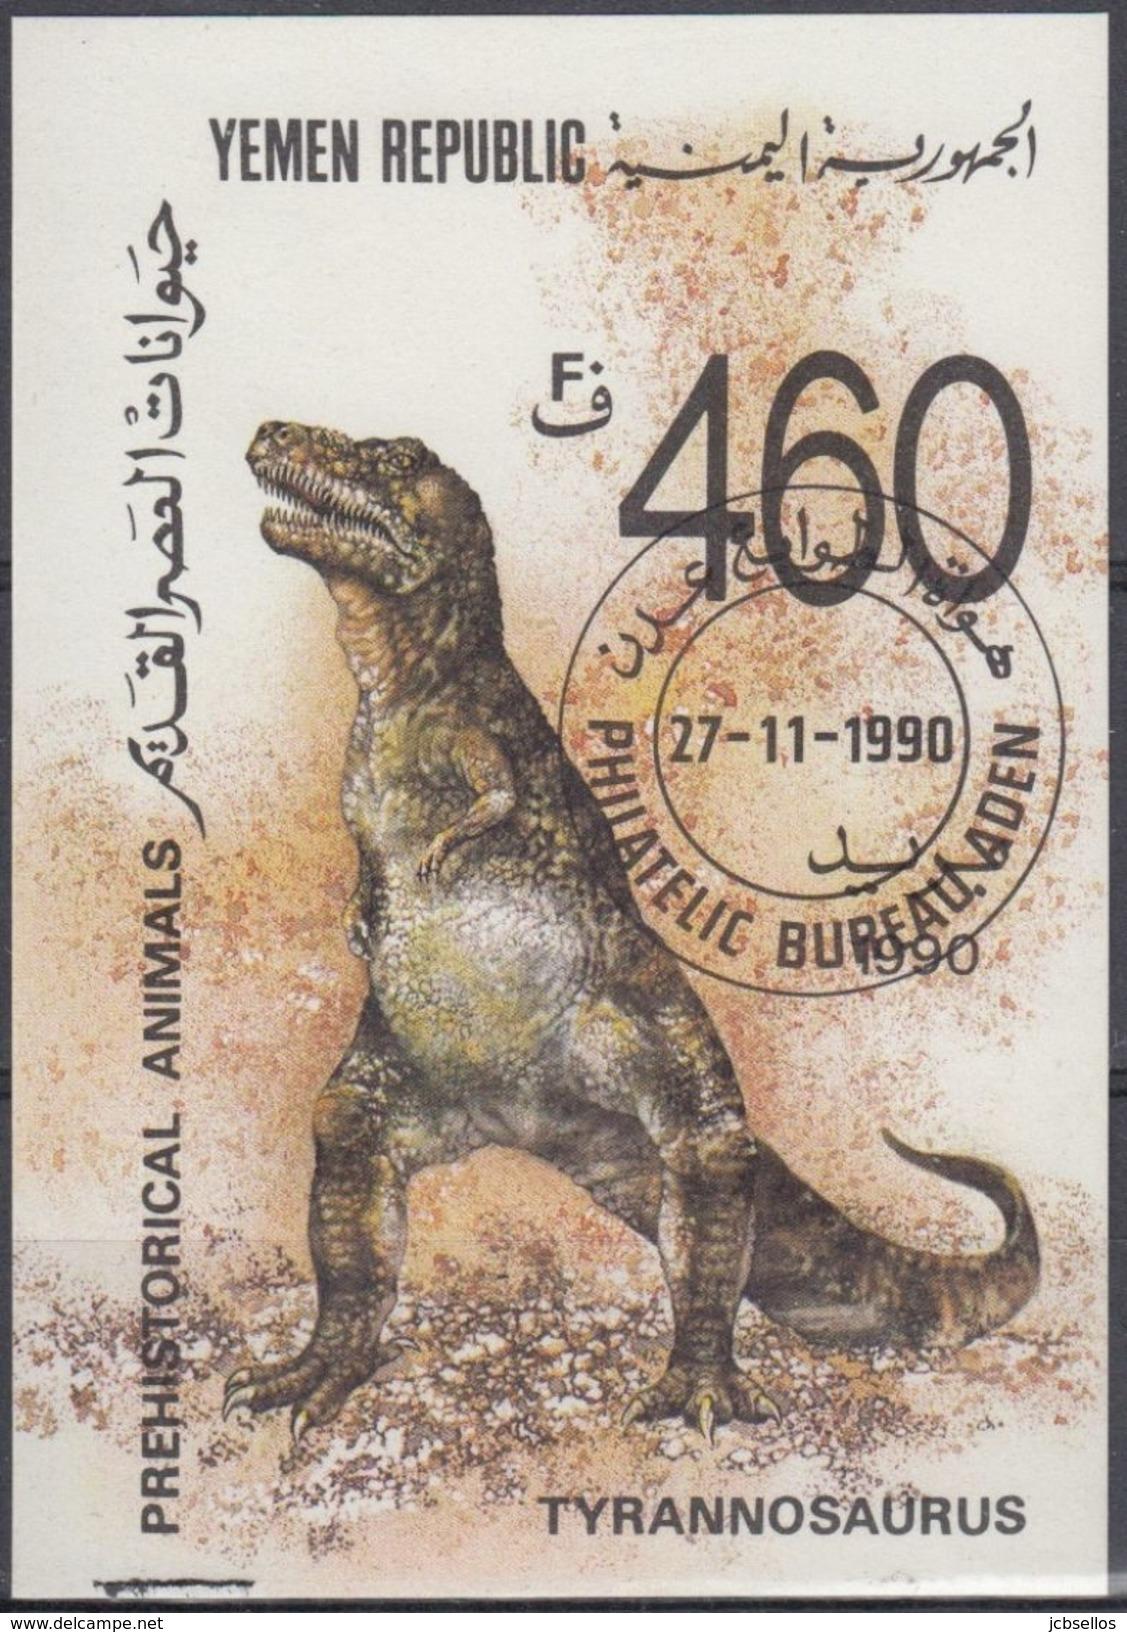 YEMEN 1990 Nº HB-3 USADO - Yemen